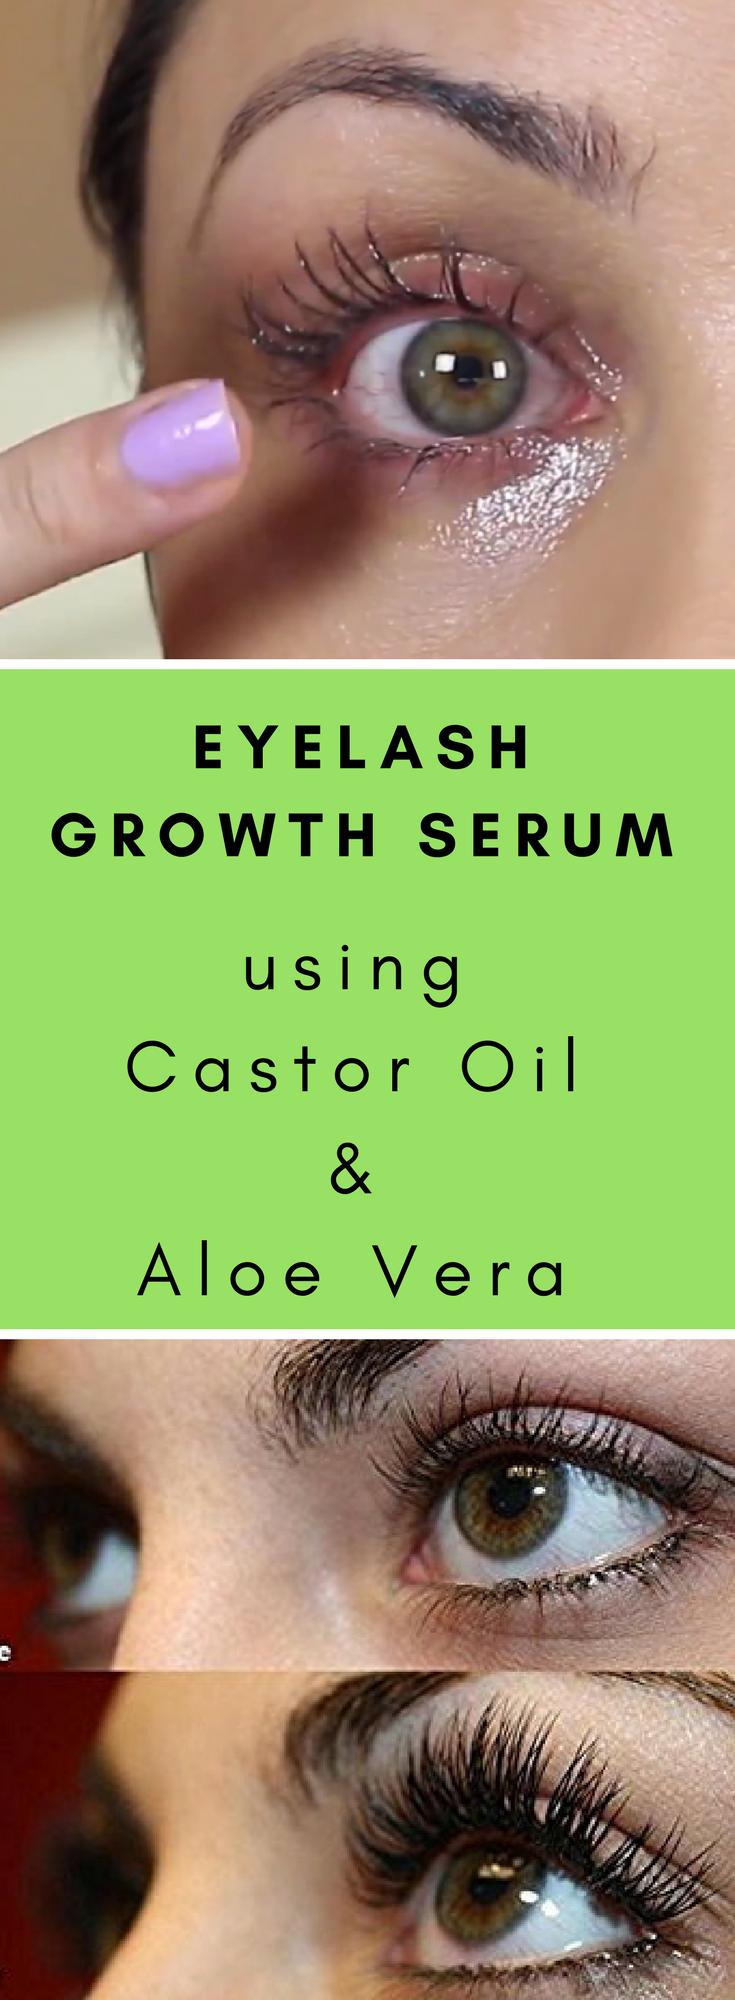 317c88d3af7 Eyelash Growth Serum Using Castor Oil And Aloe Vera | Κρέμες ...